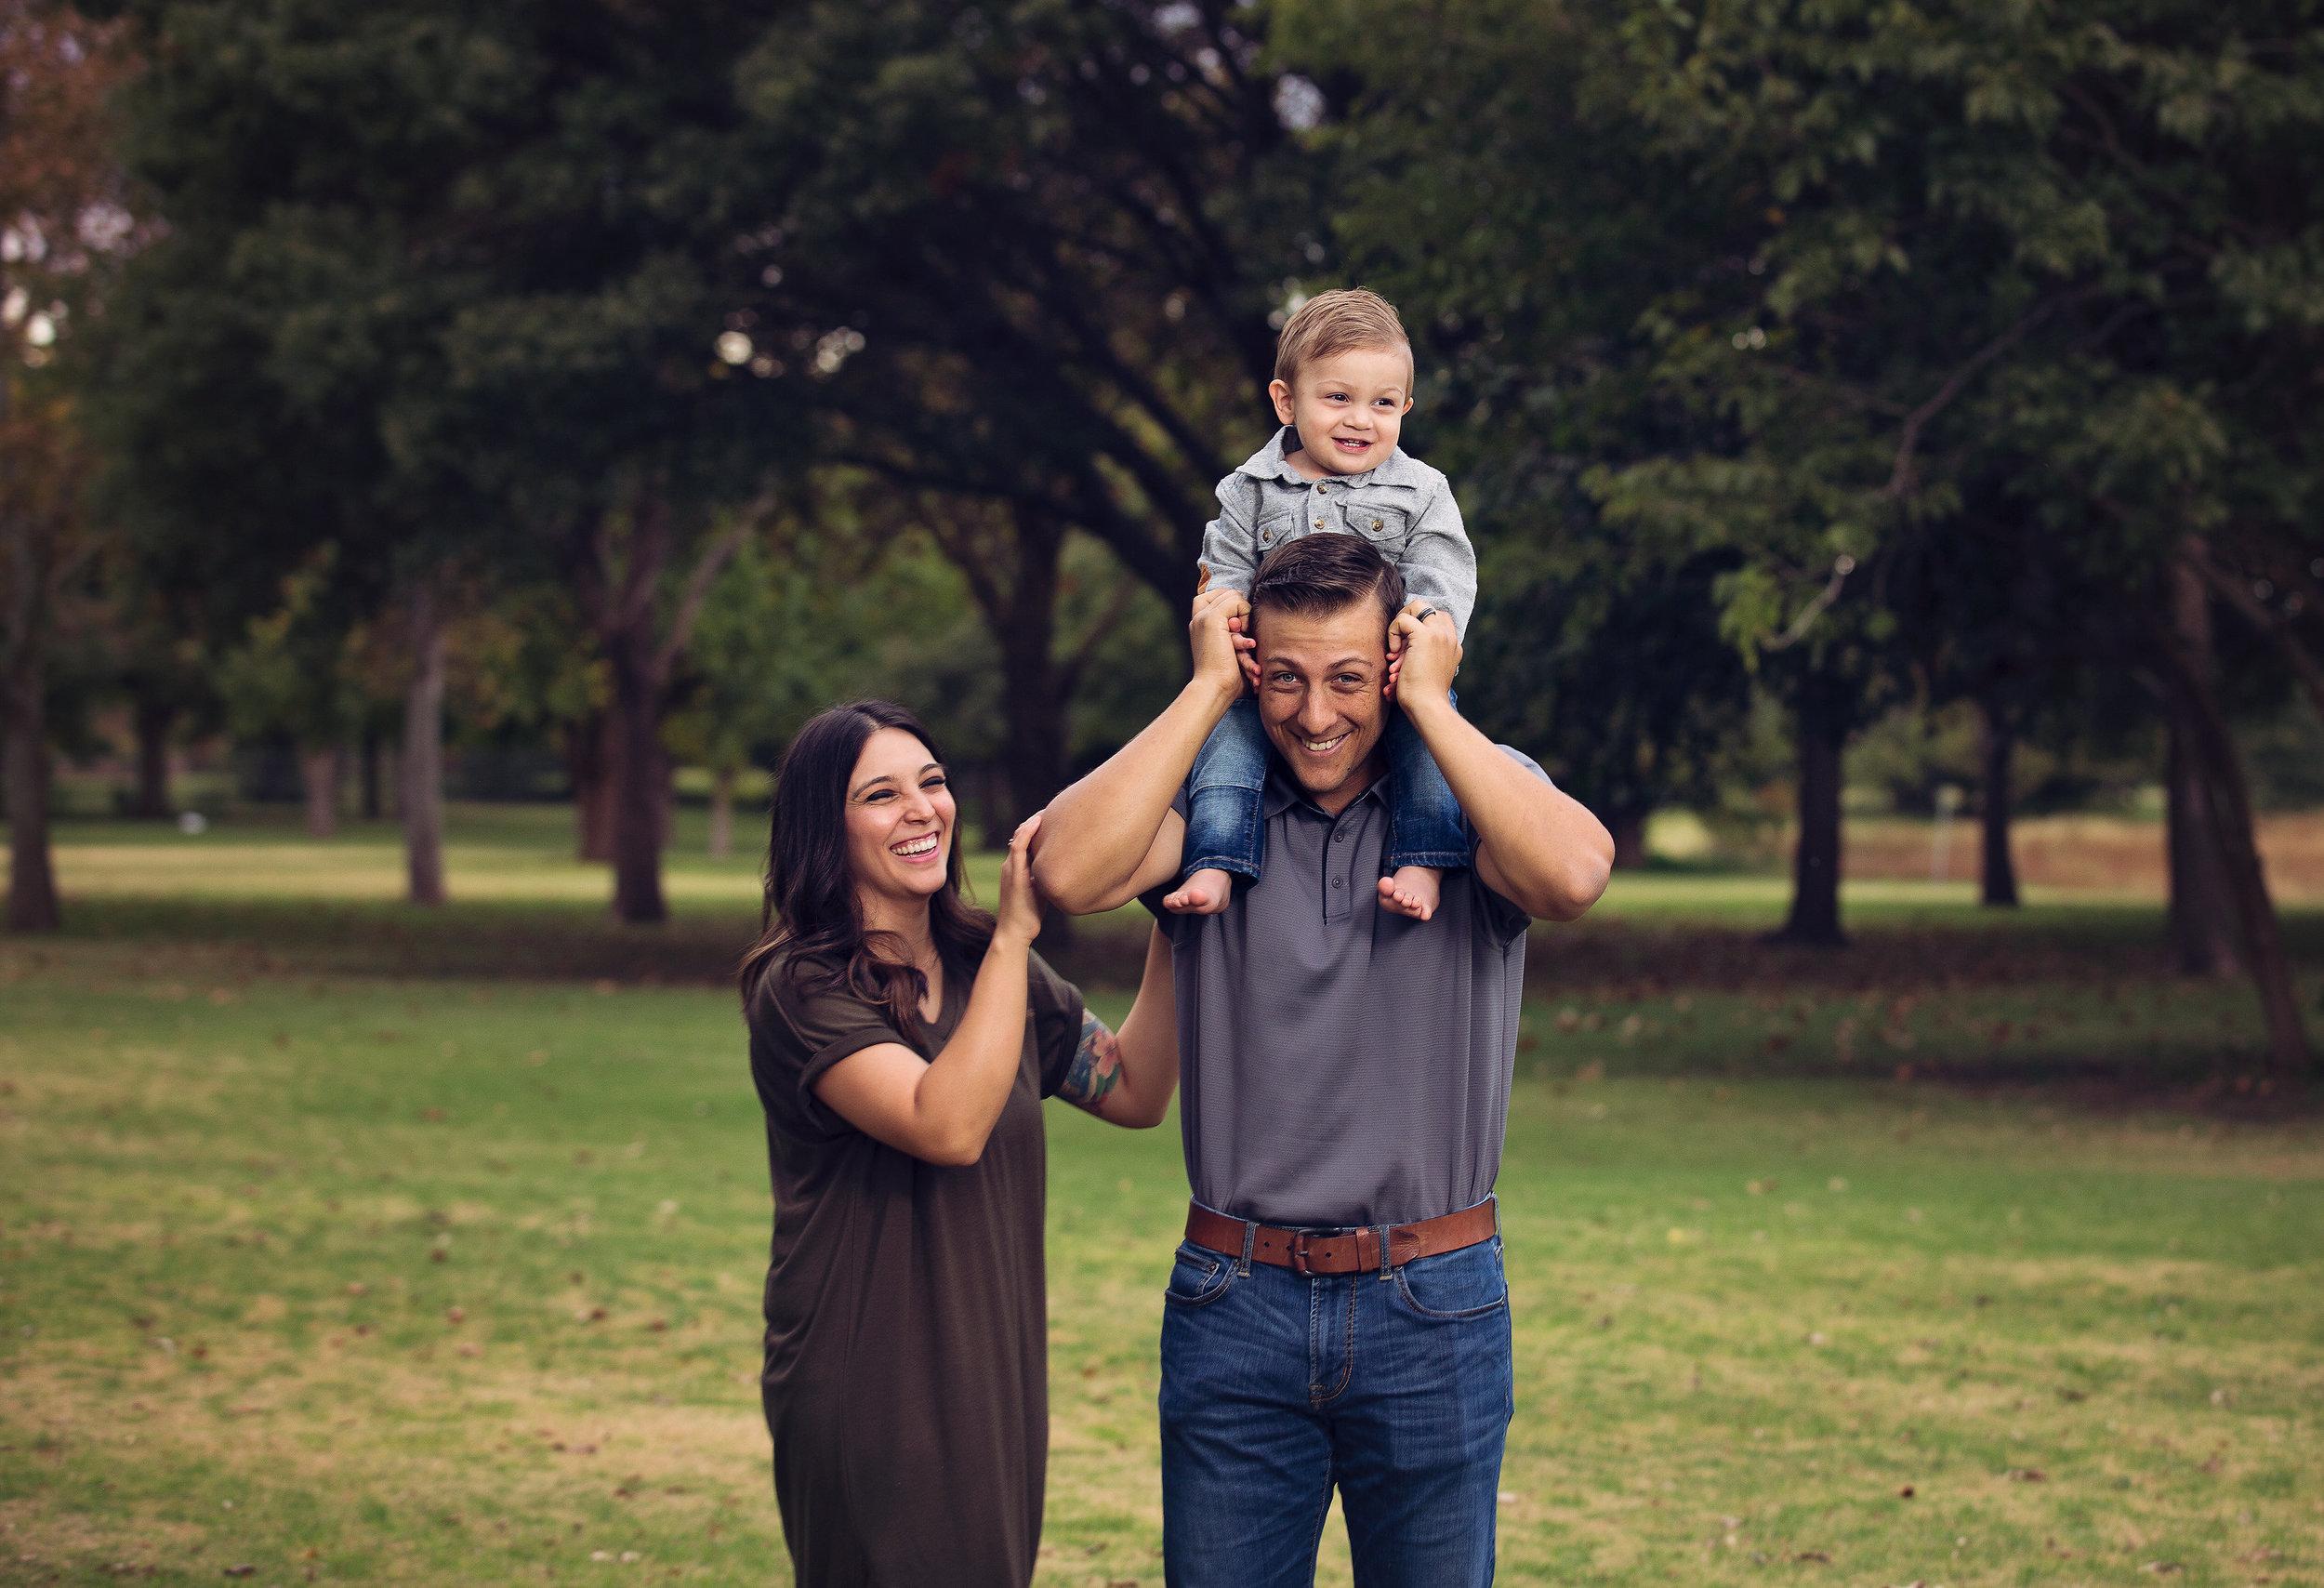 cooley-family-hobbs-newmexico-lubbock-texas-wedding-engagement-senior-photographer